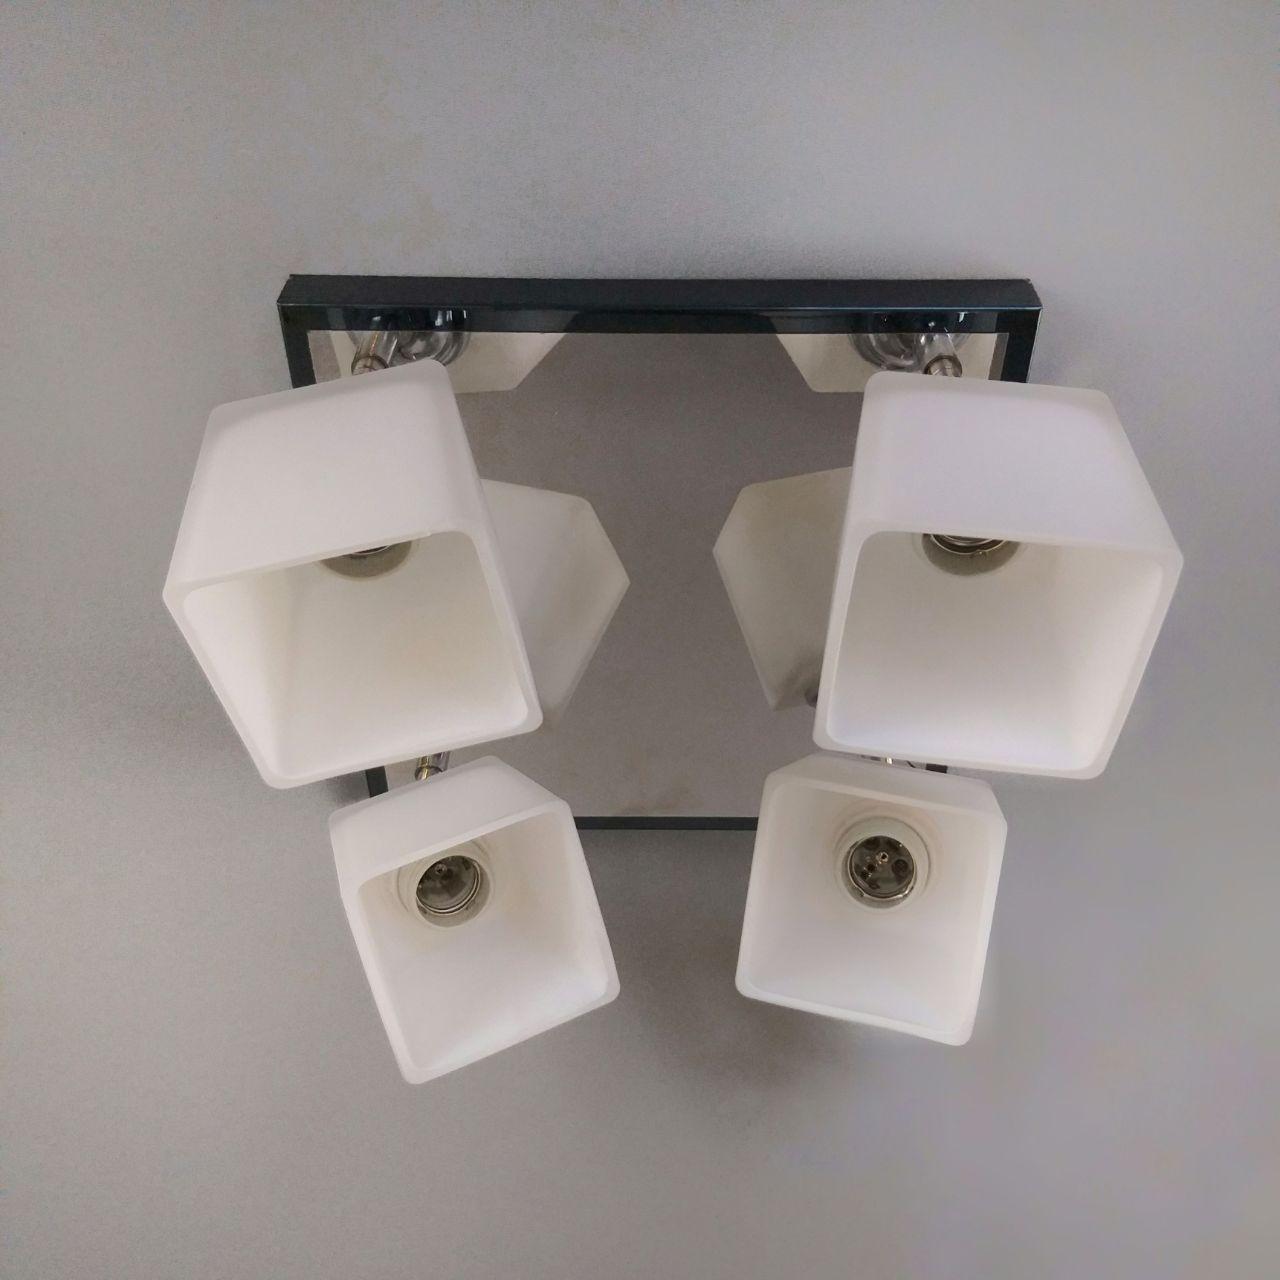 Люстра потолочная на 4 лампы 06-51203/4 CR+черн.жемчуг(ZZH)+WT